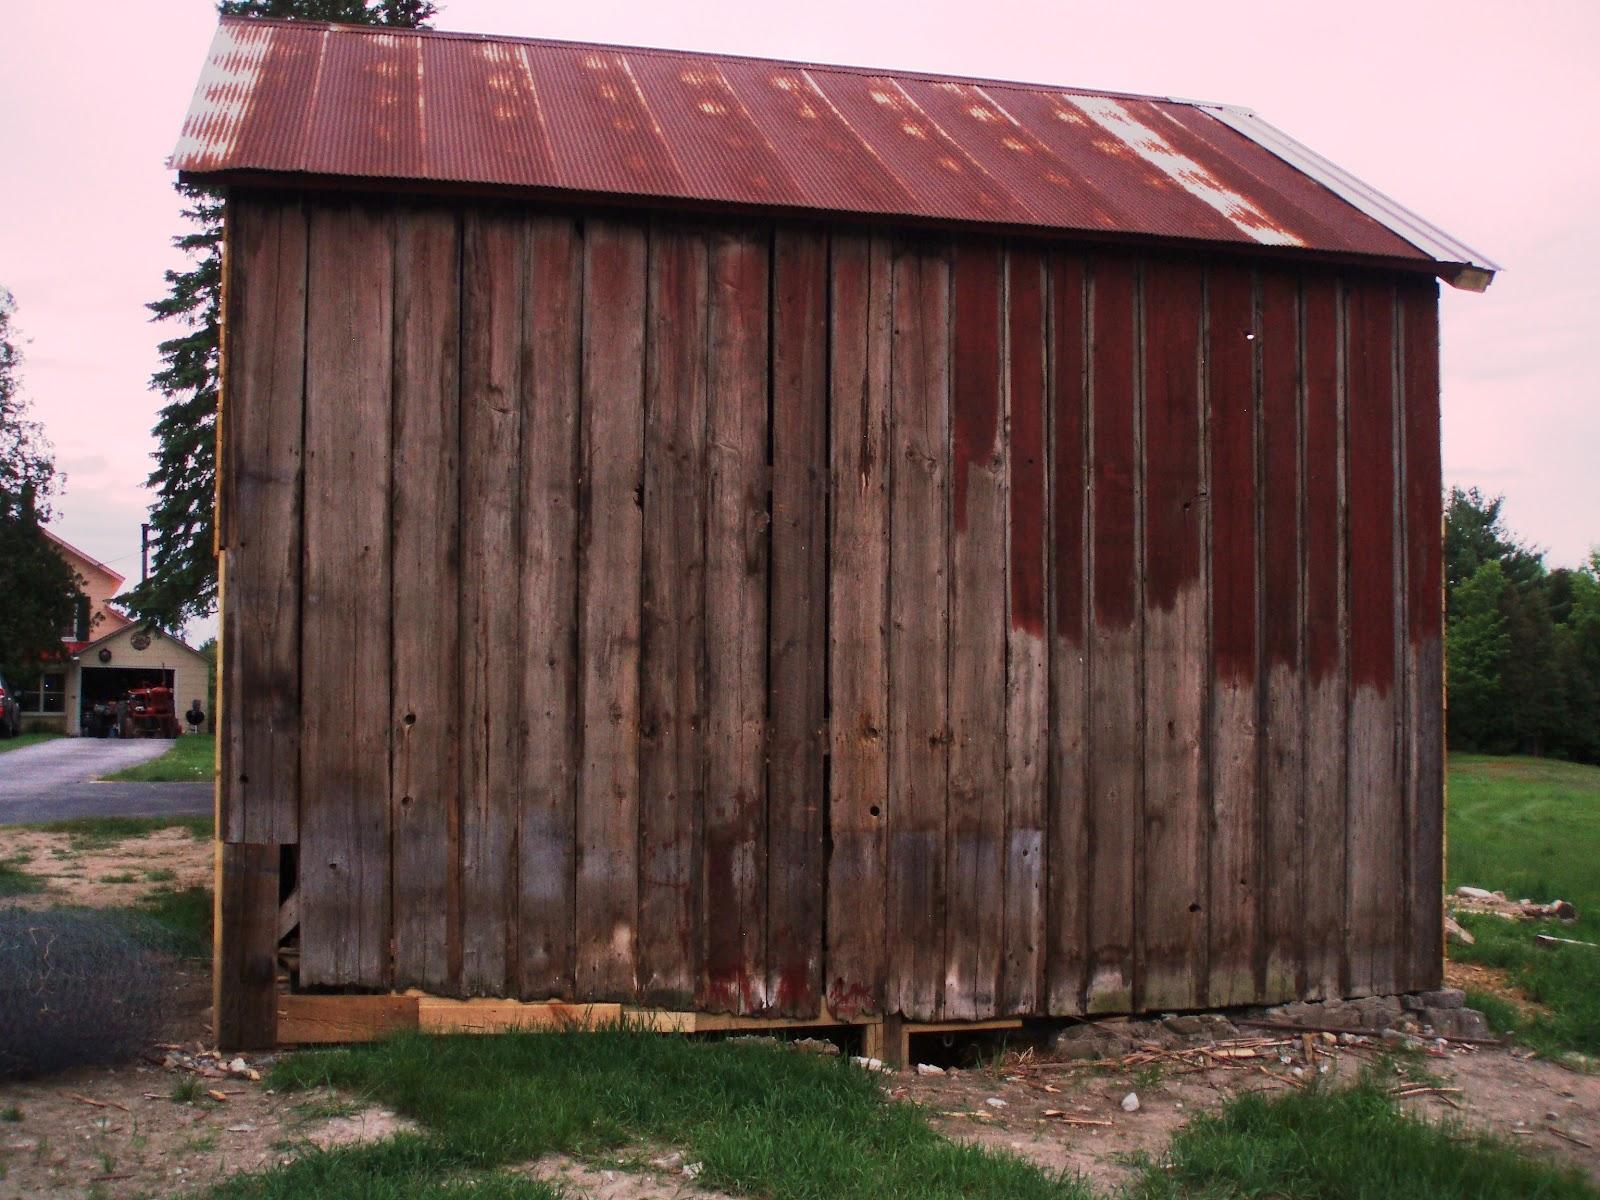 A and B Farm: Renovating Old Barns